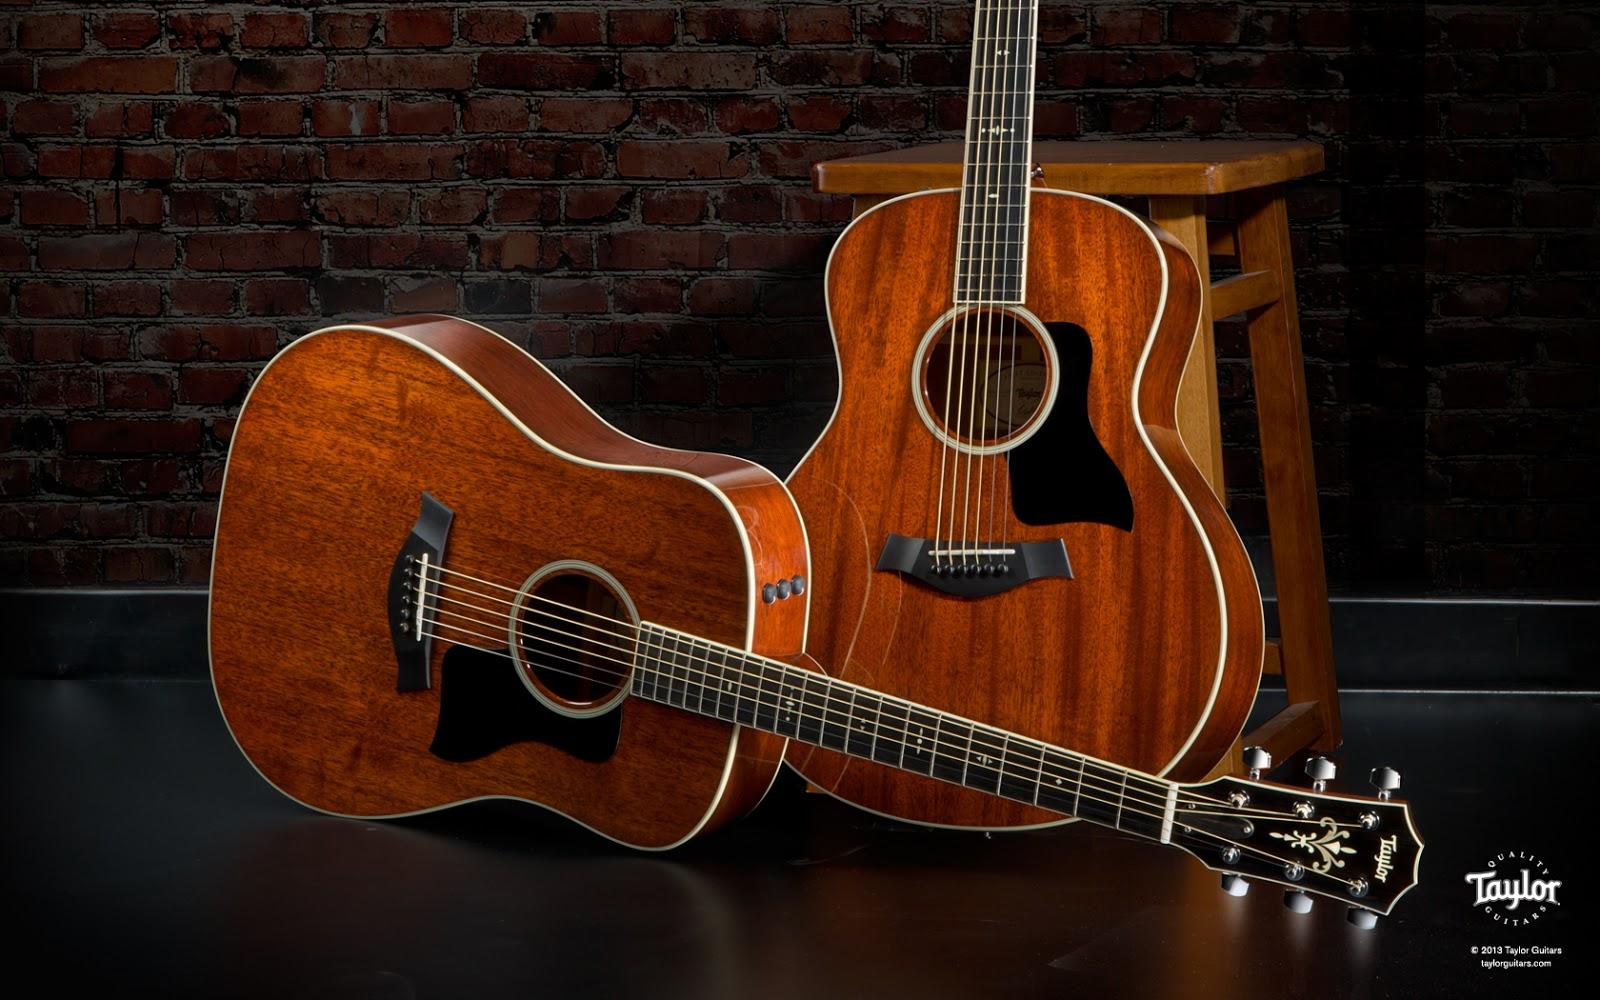 Taylor Guitar Background Wallpaper